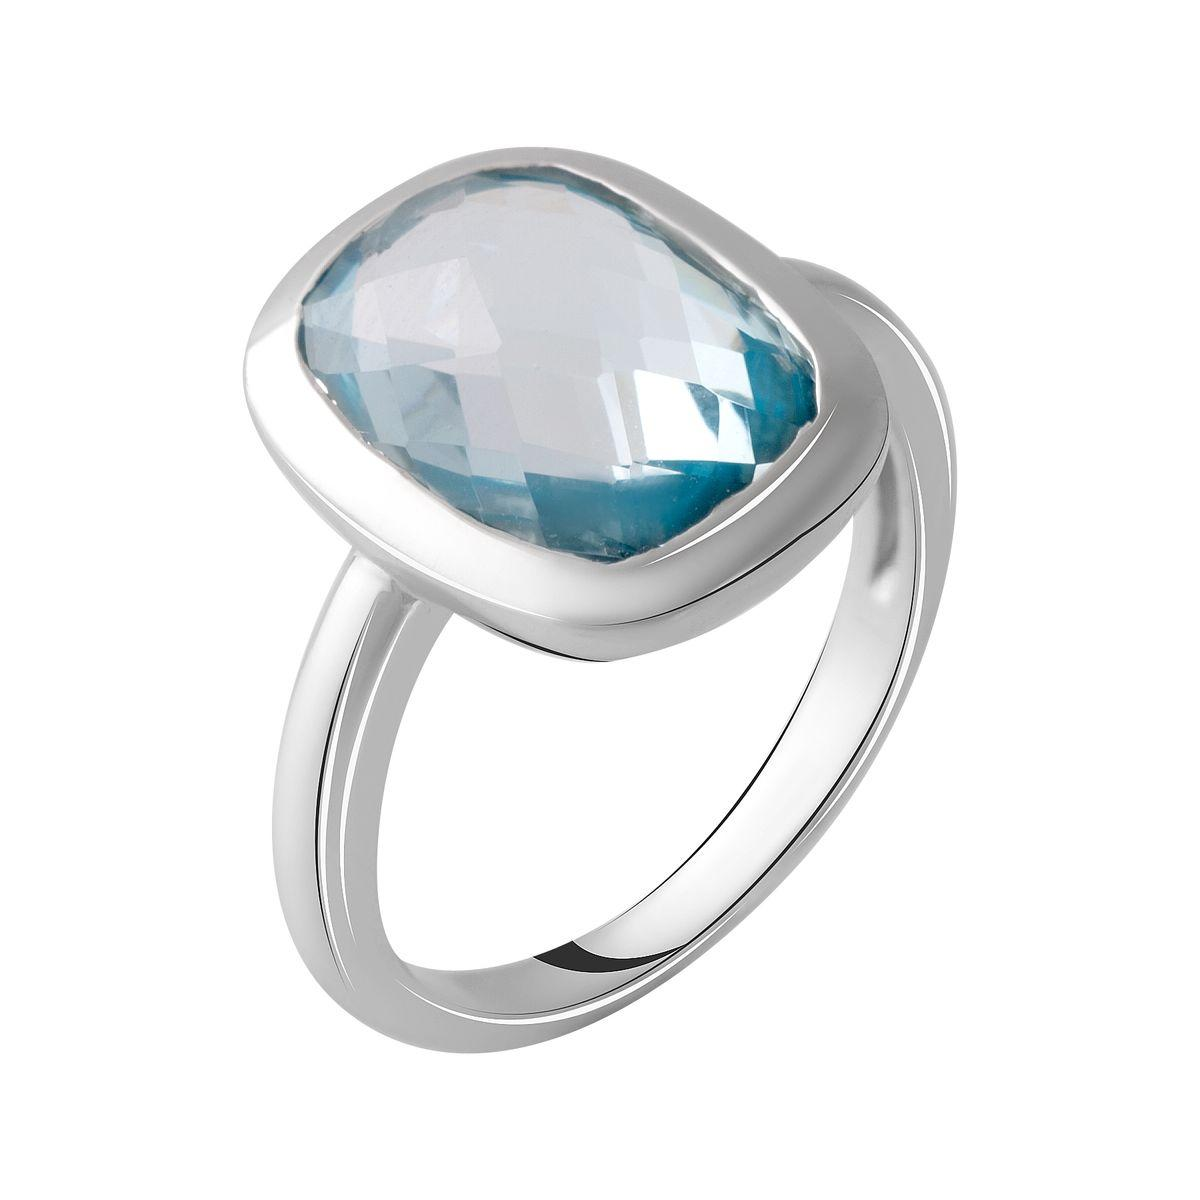 Серебряное кольцо DreamJewelry с натуральным топазом 7.33ct (2049487) 18 размер